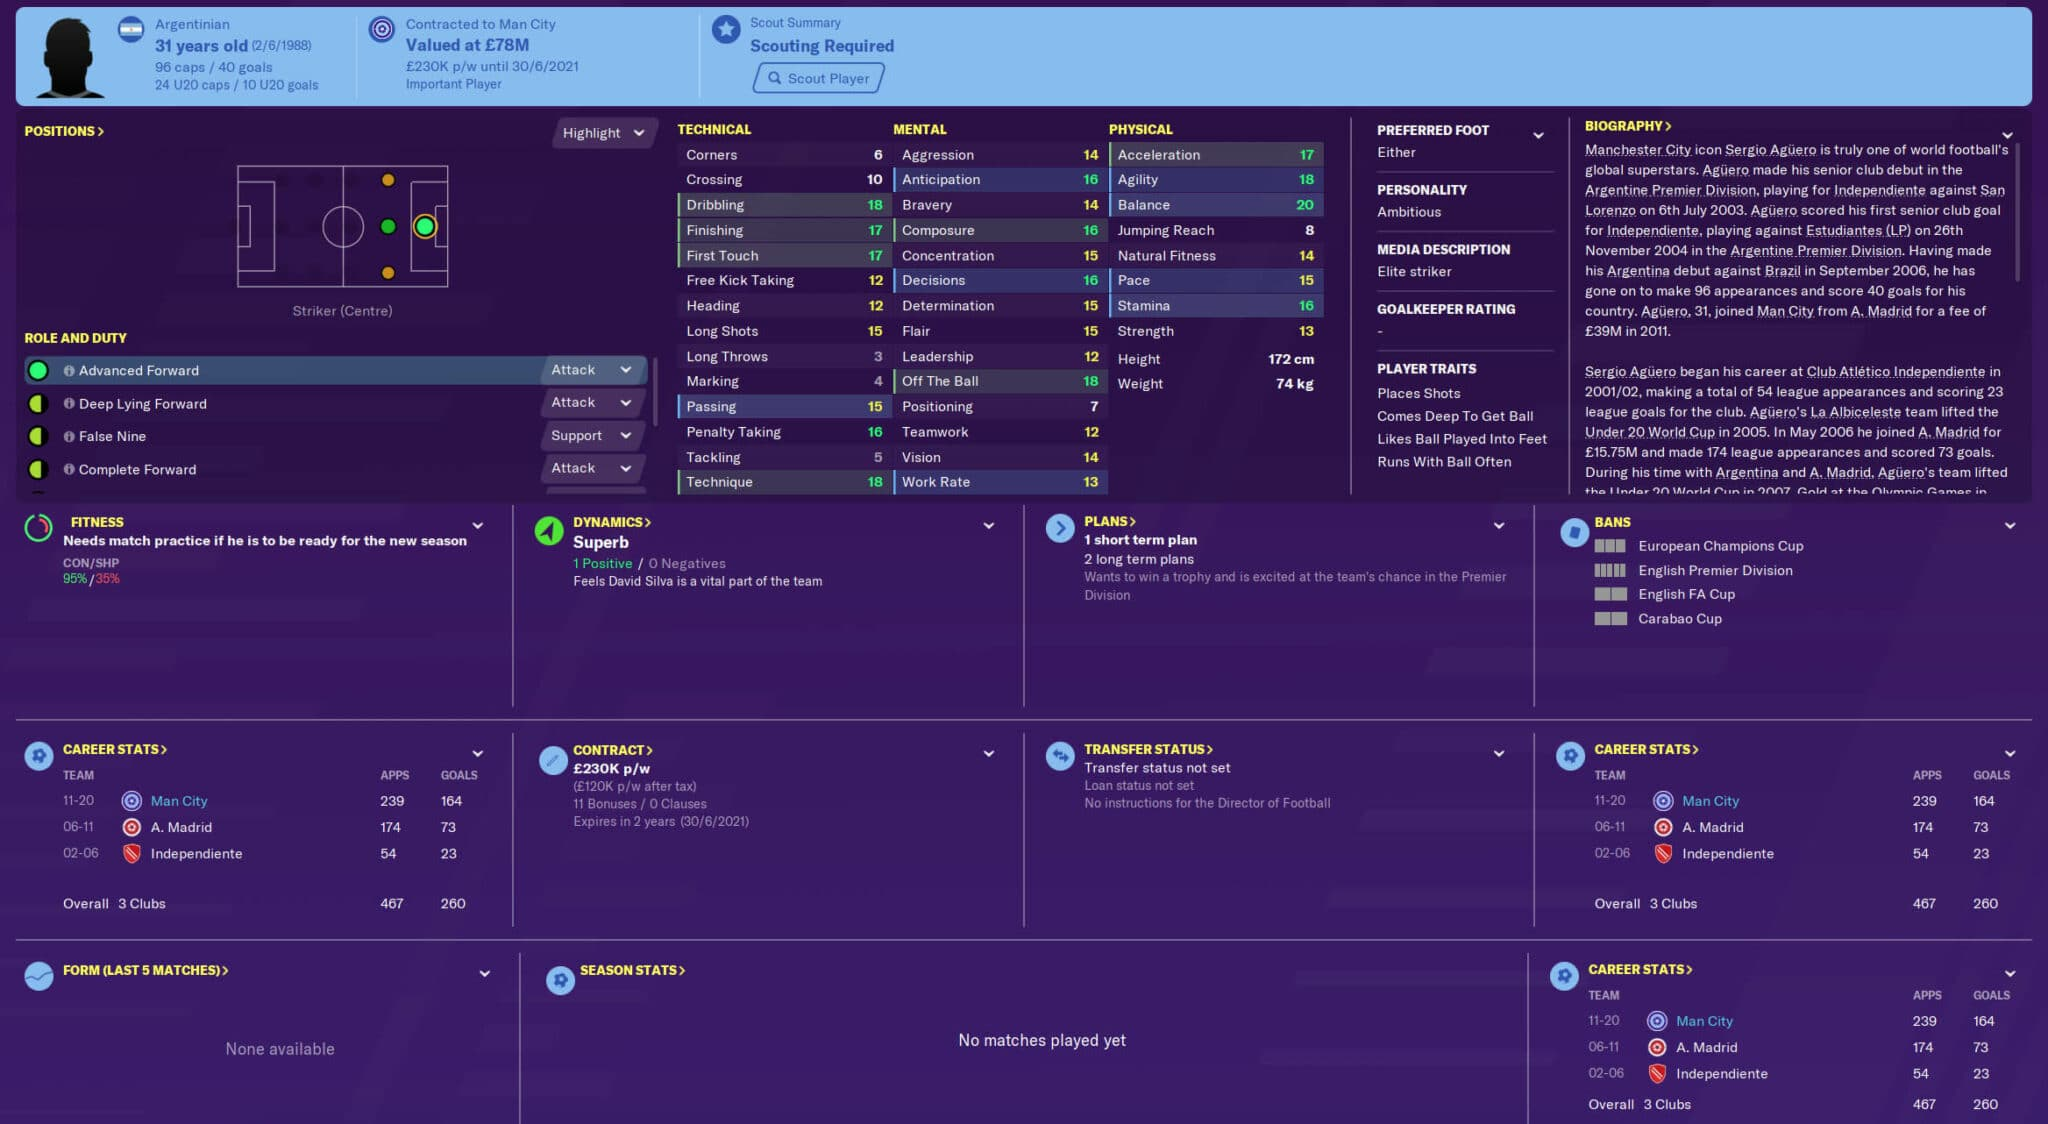 fm20 aguero Football Manager 2020 Best Players